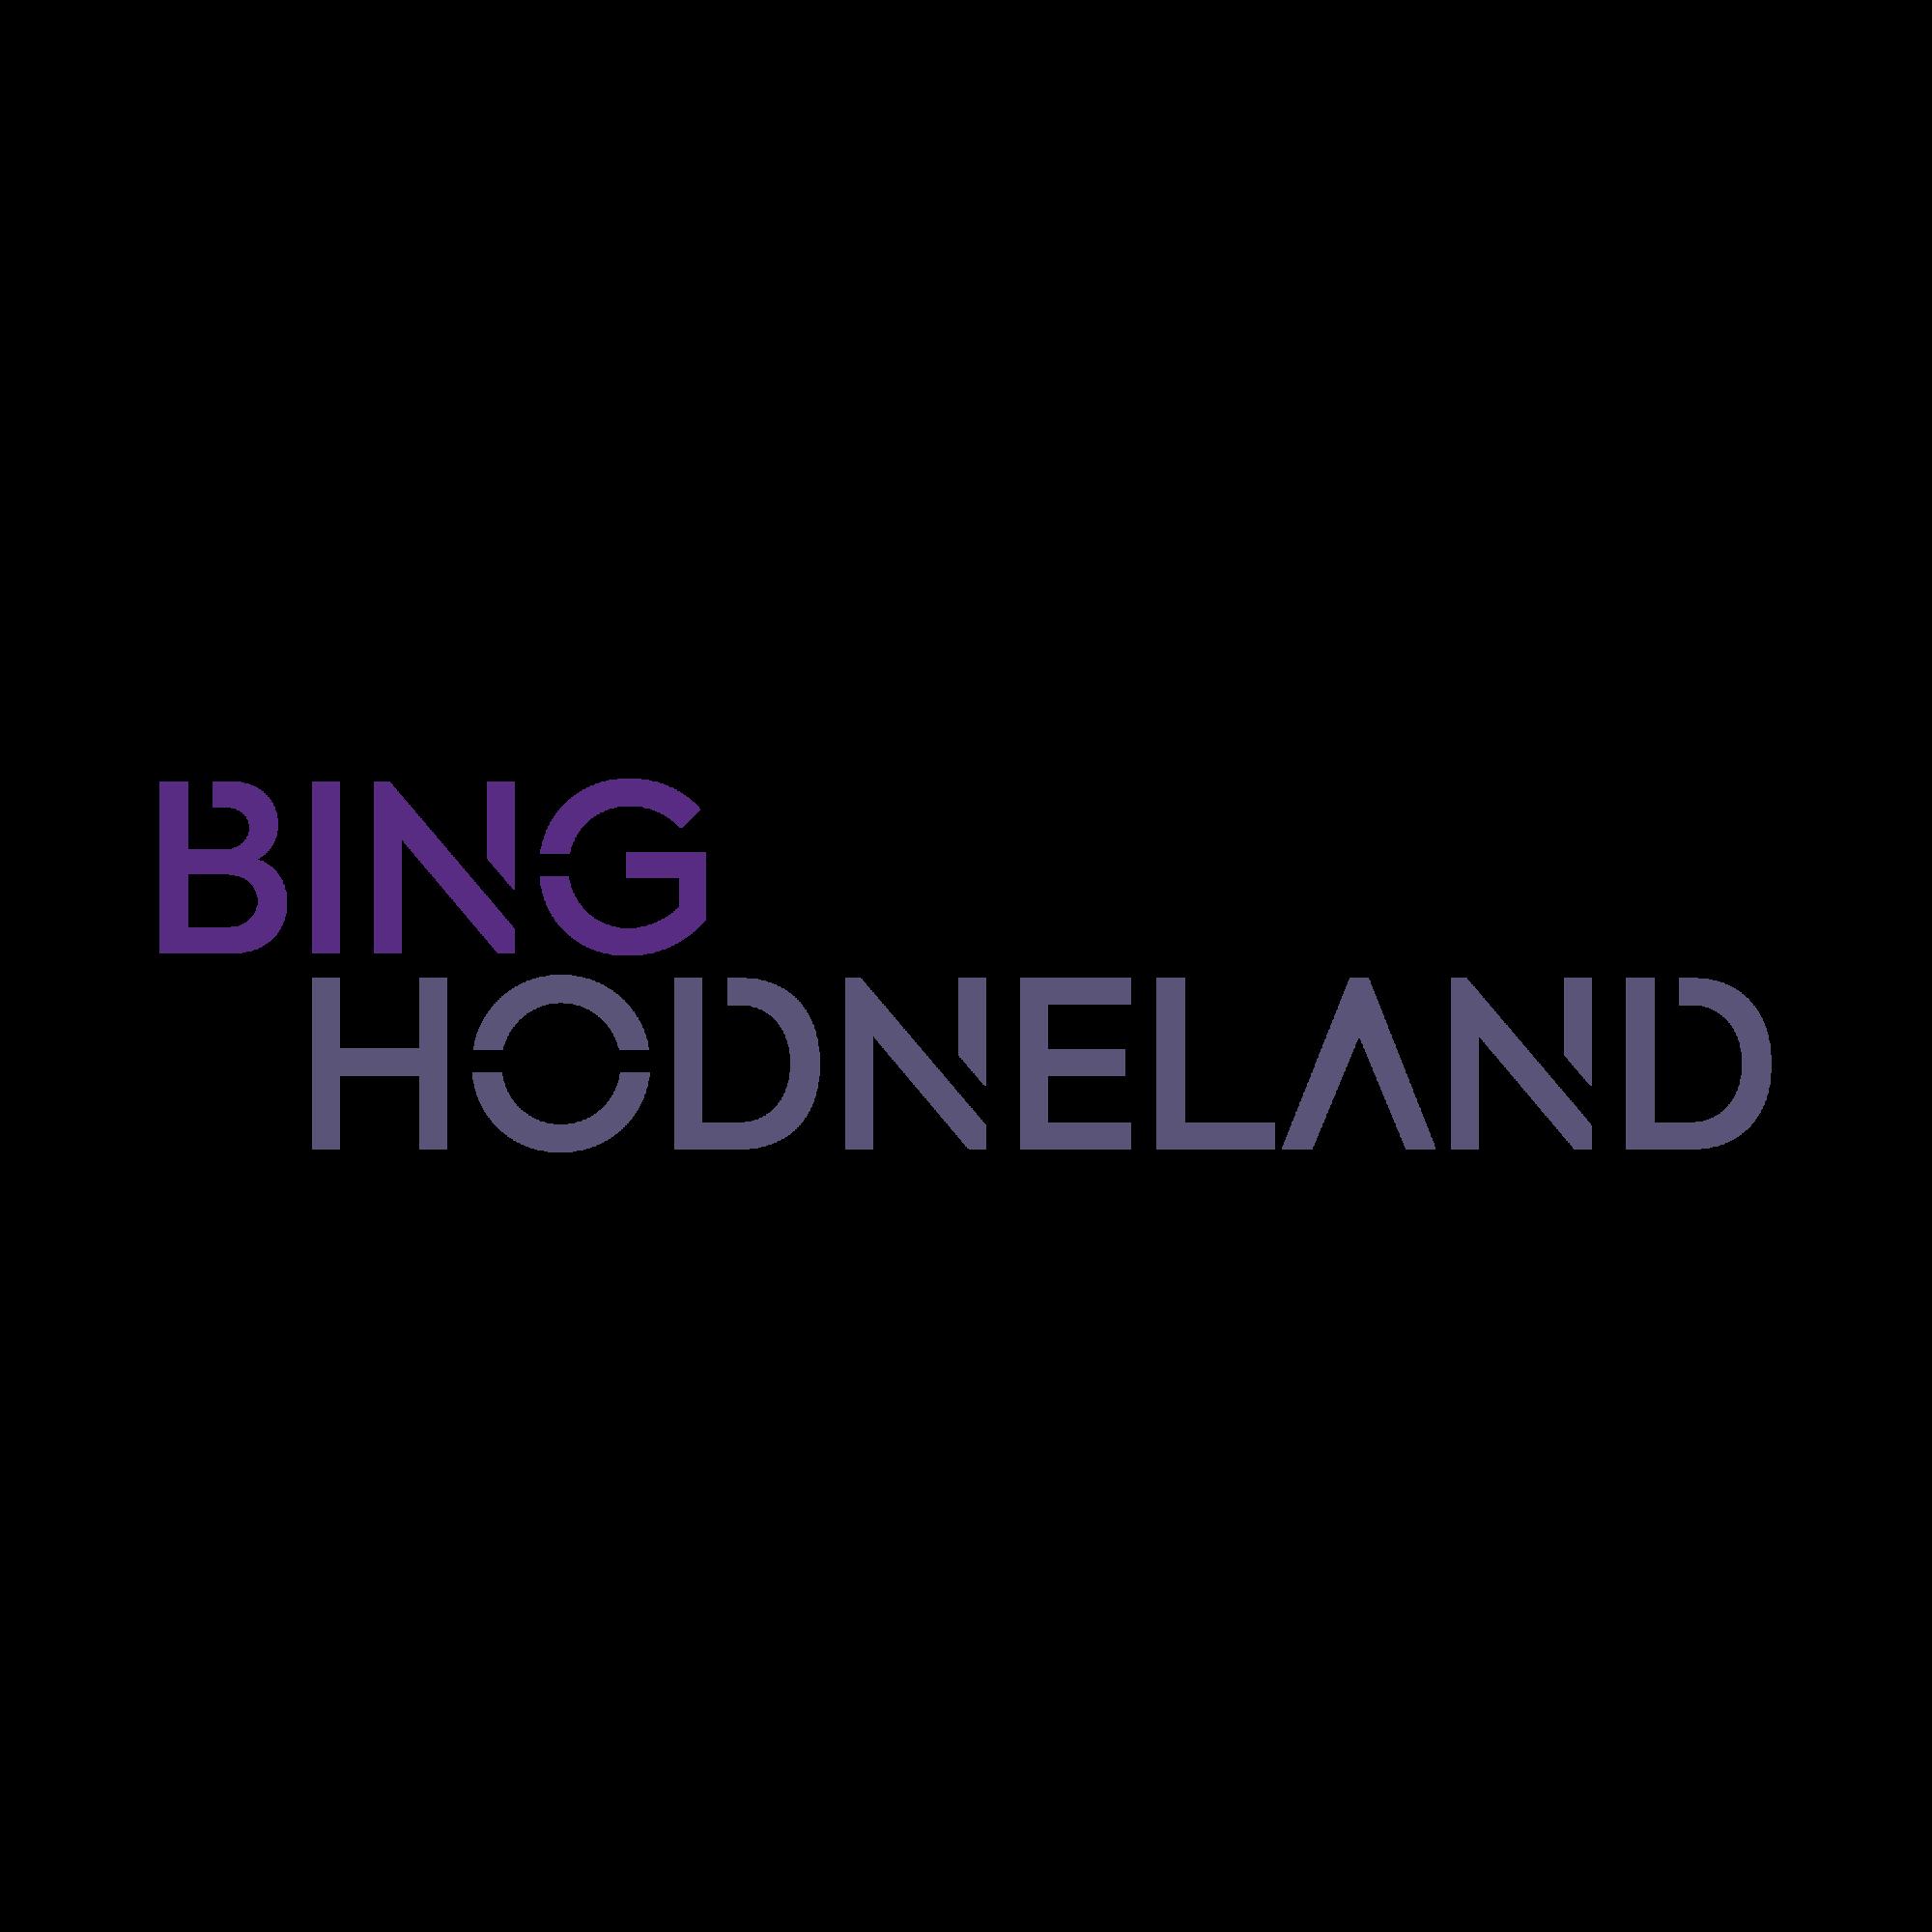 Bing Hodneland